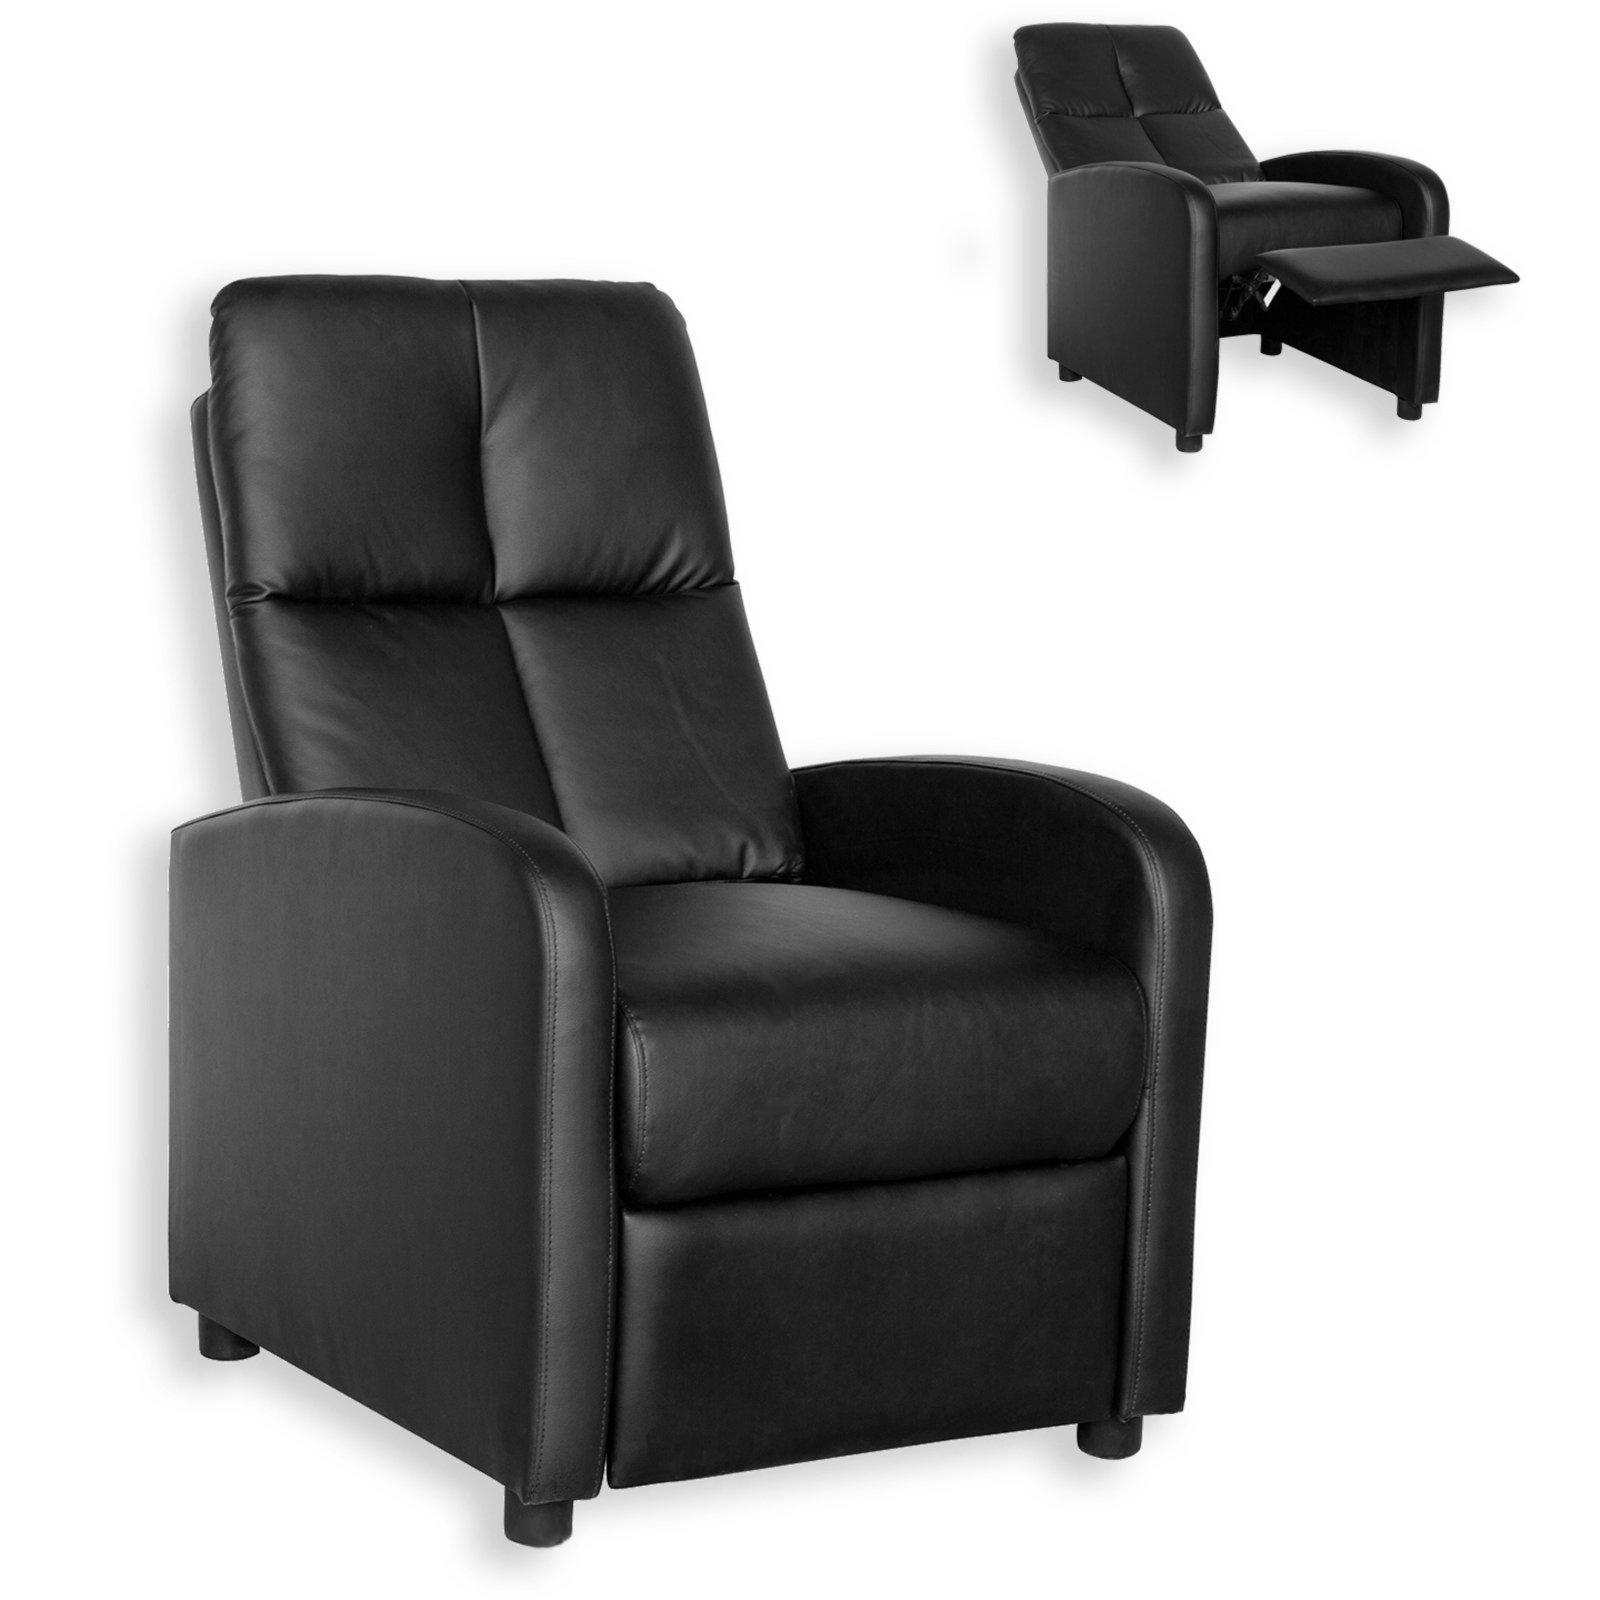 TV Sessel schwarz Federkern Relaxfunktion